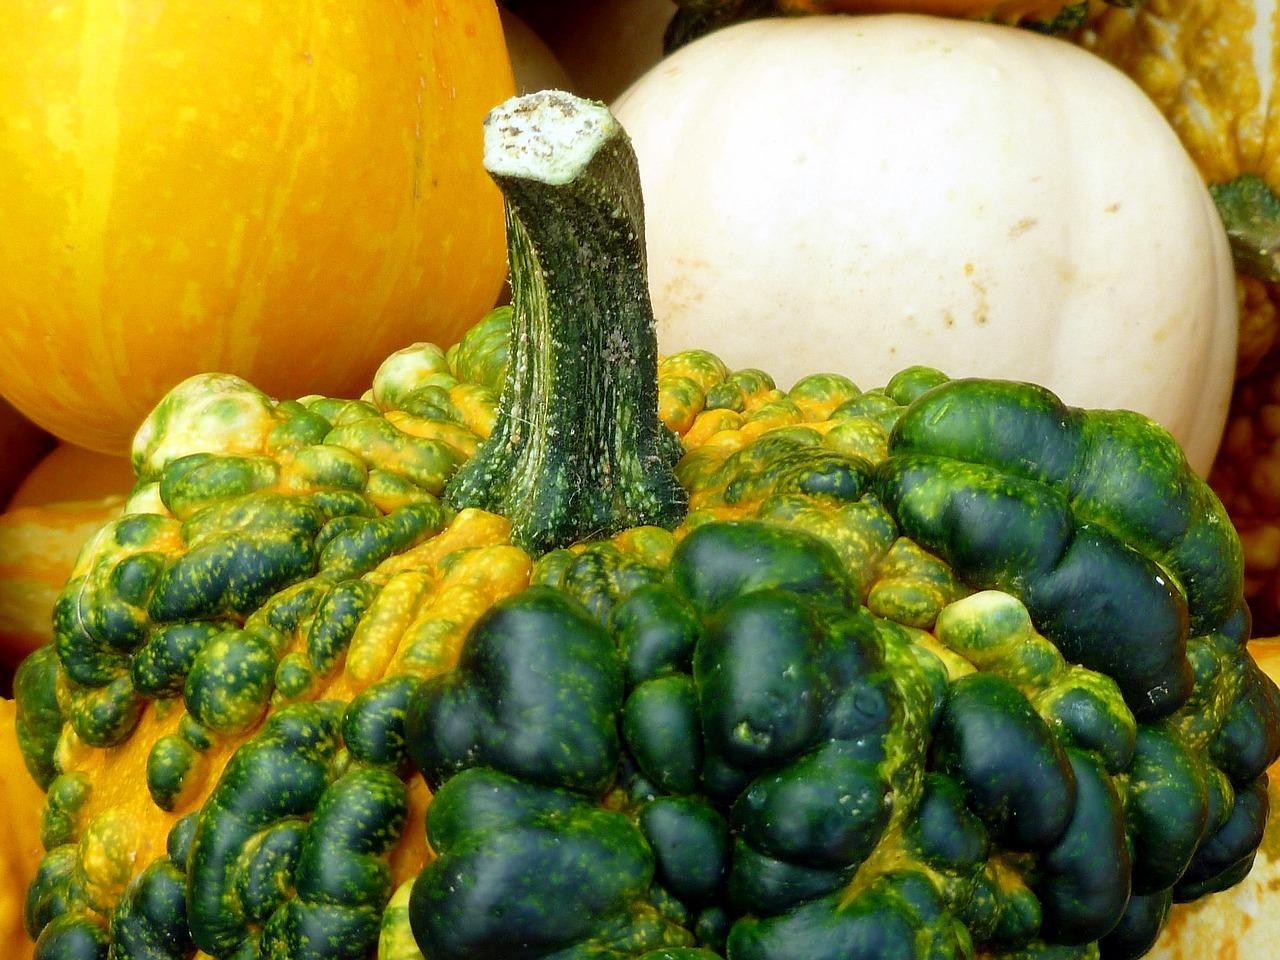 Pumpkin Plant Vegetables Autumn Garden Free Image From Needpix Com